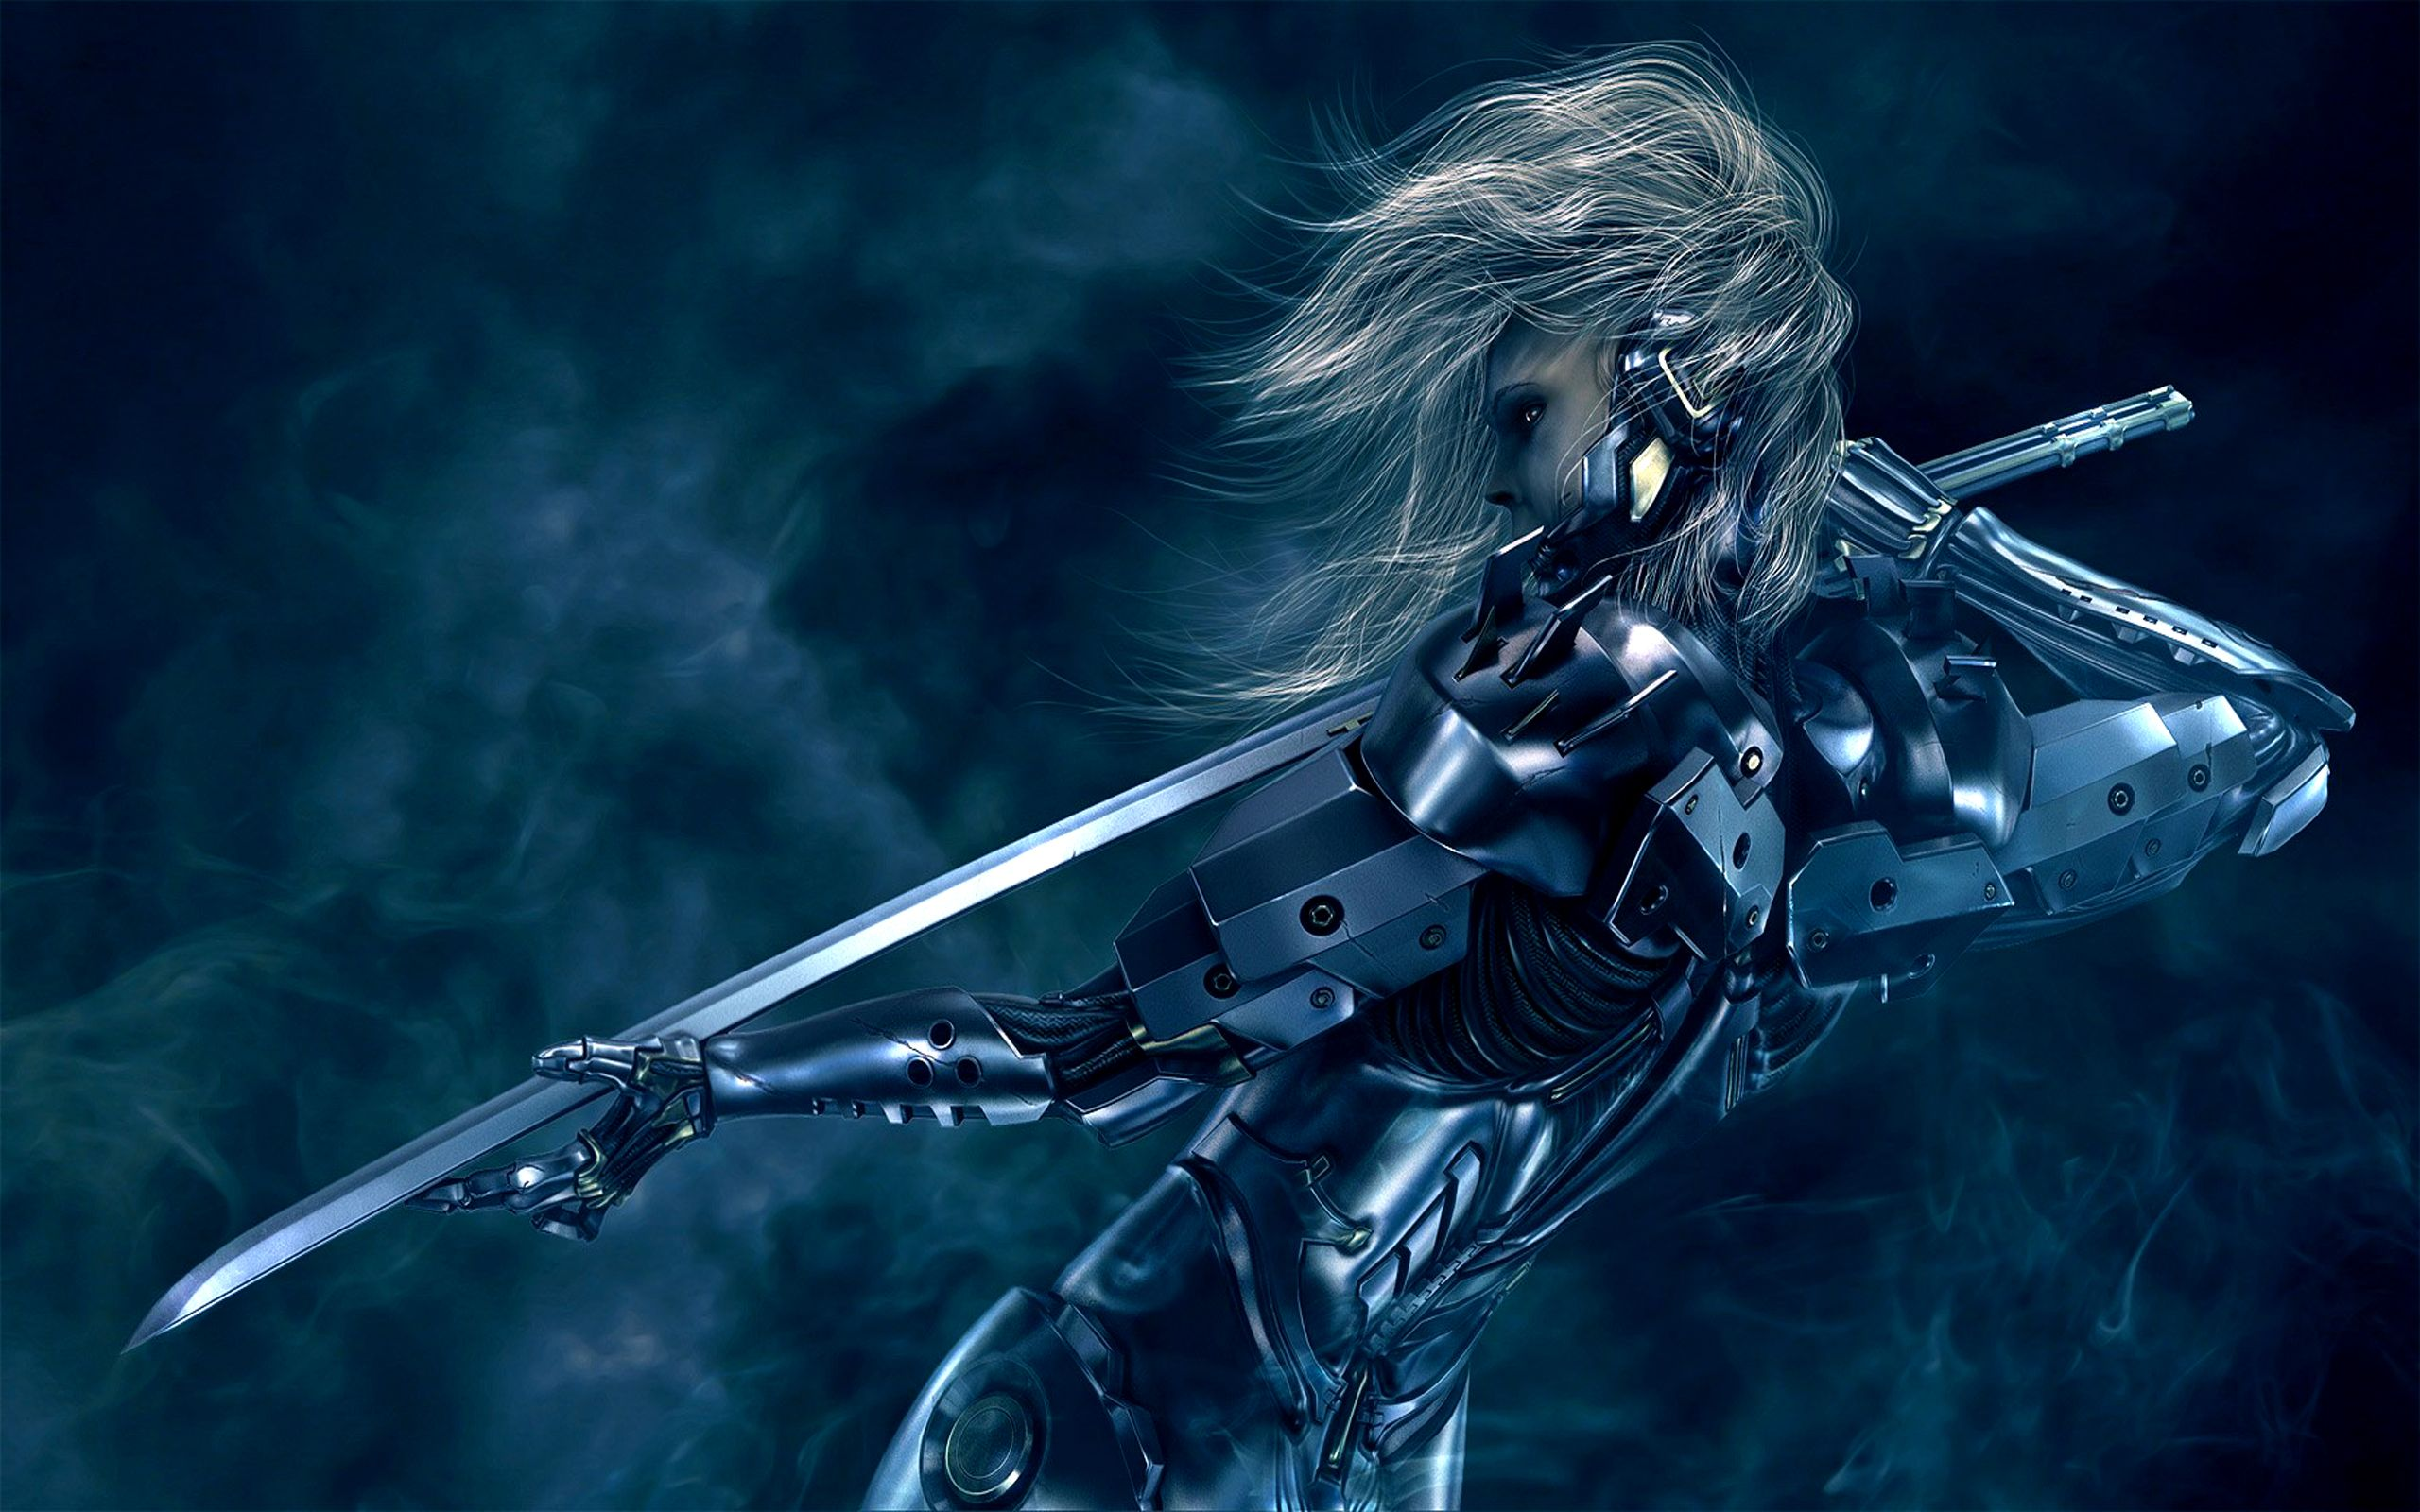 Cyborg Samurai Wallpaper Background 2560 X 1600 Id 109172 Wallpaper Abyss Metal Gear Rising Metal Gear Cool Backgrounds Hd